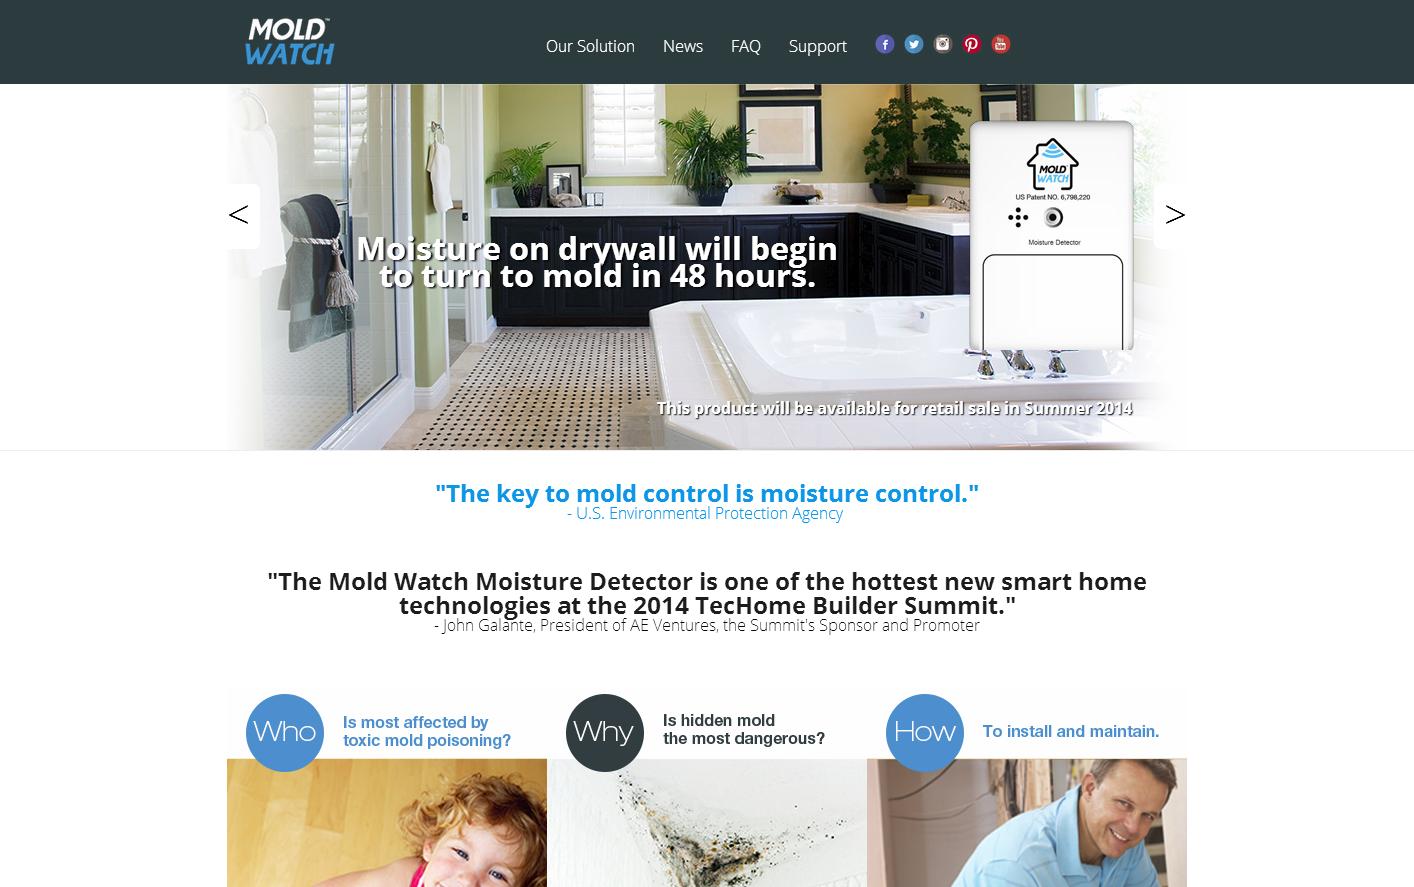 Mold Watch